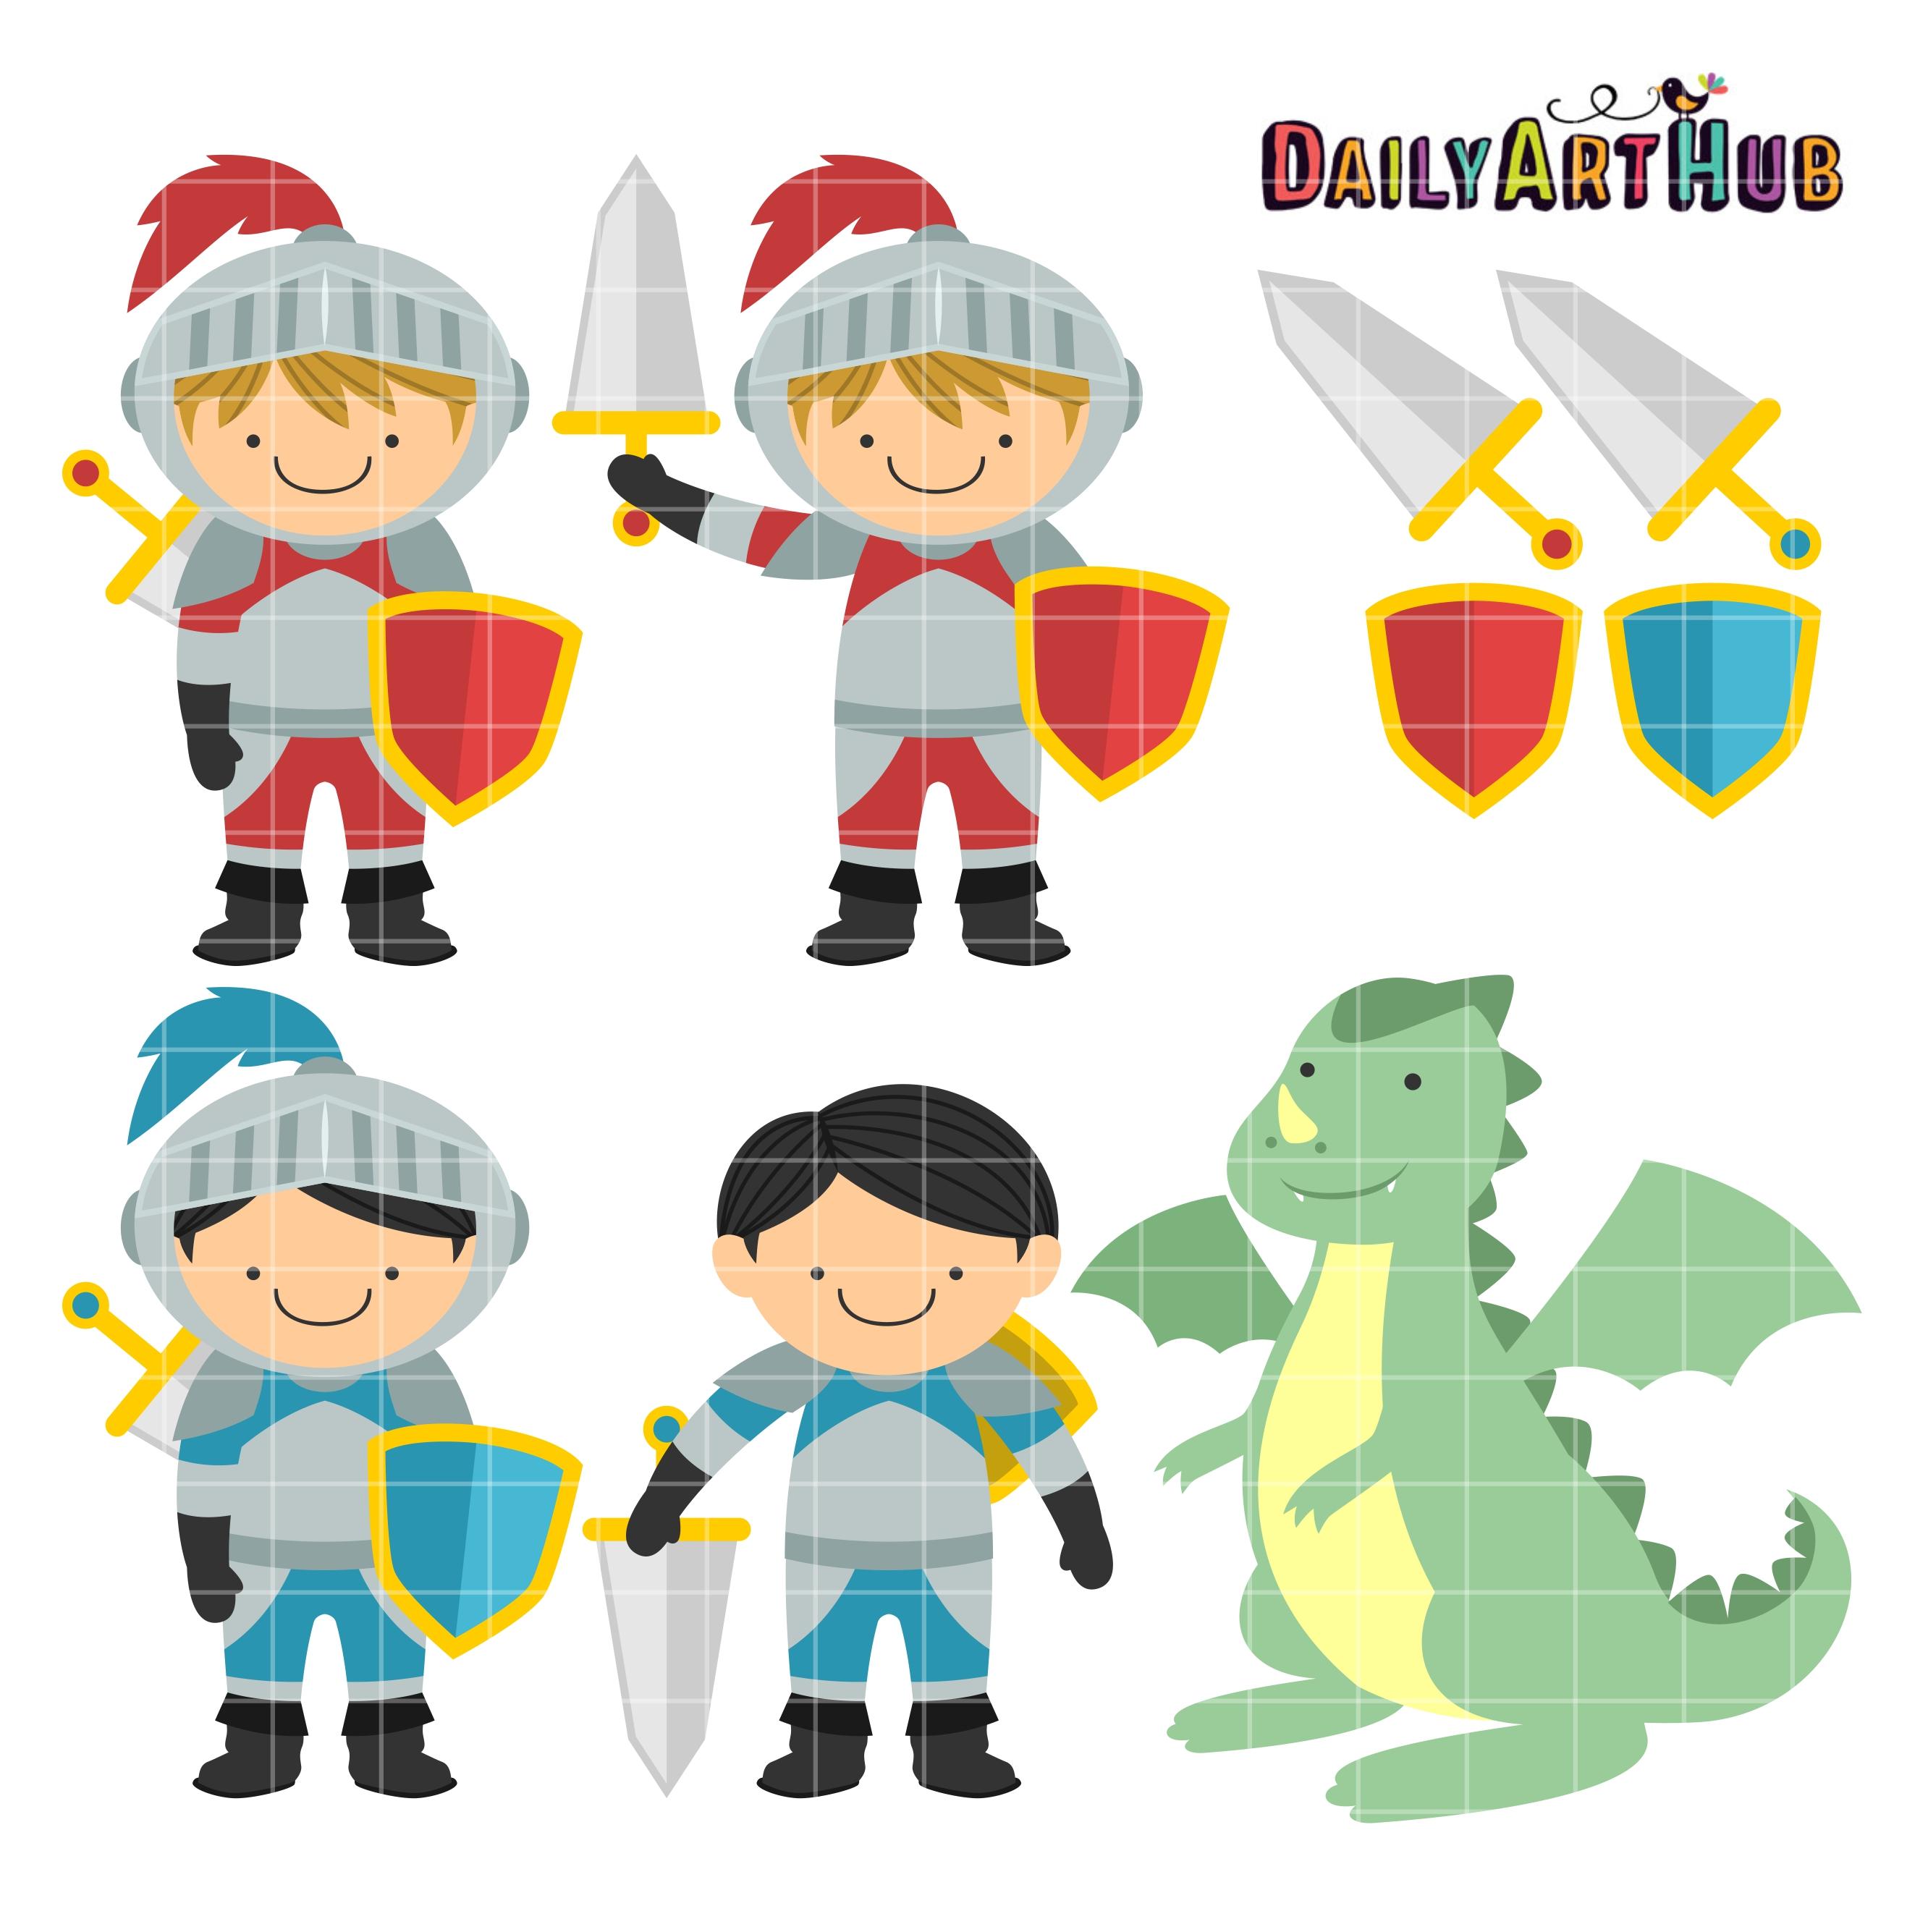 Cute Knights And Dragon Clip Art Set | Daily Art Hub